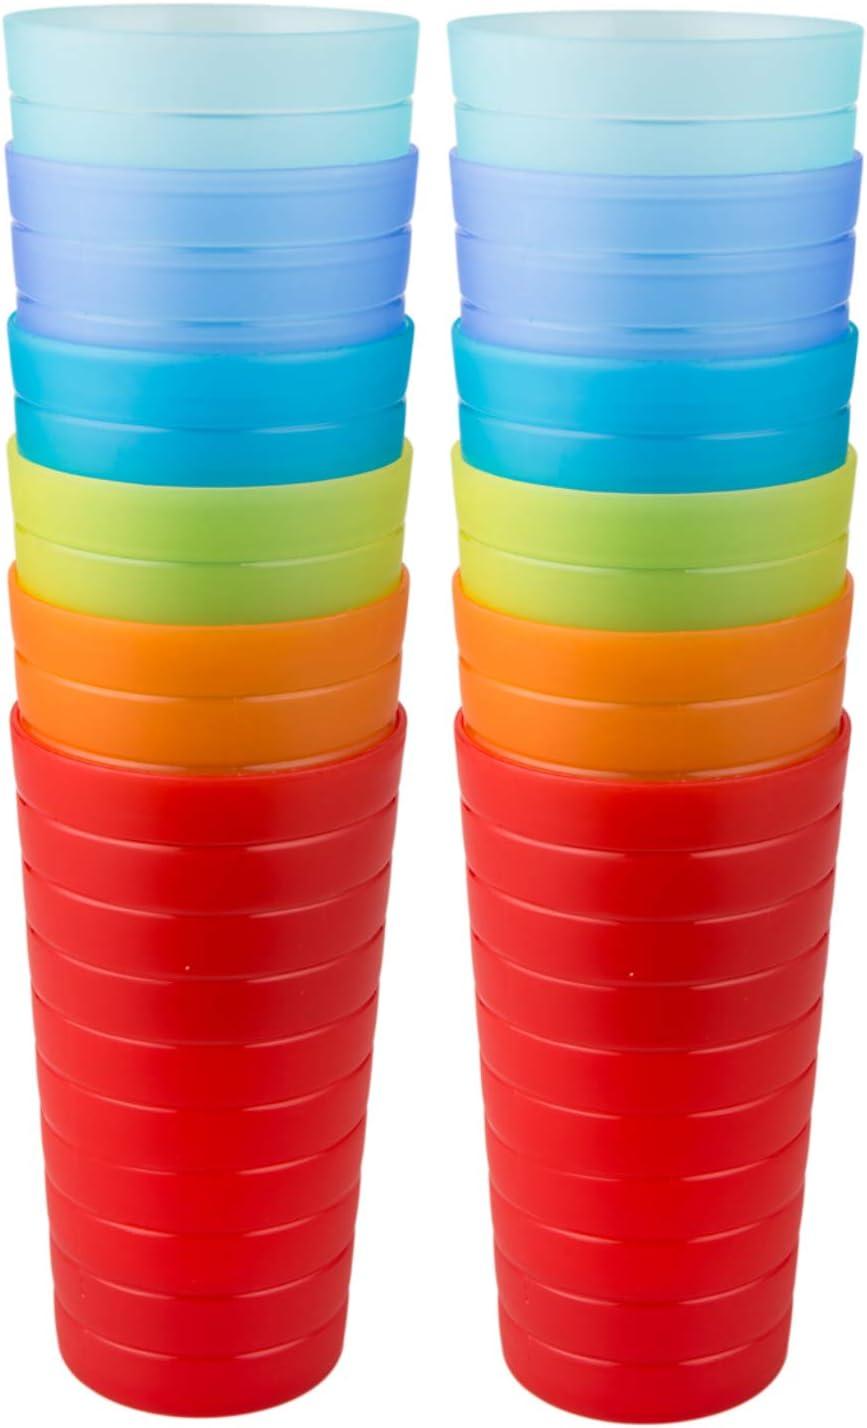 AOYITE Plastic Tumblers Drinking Glasses Regular store of 12 Set Super-cheap Break Resis